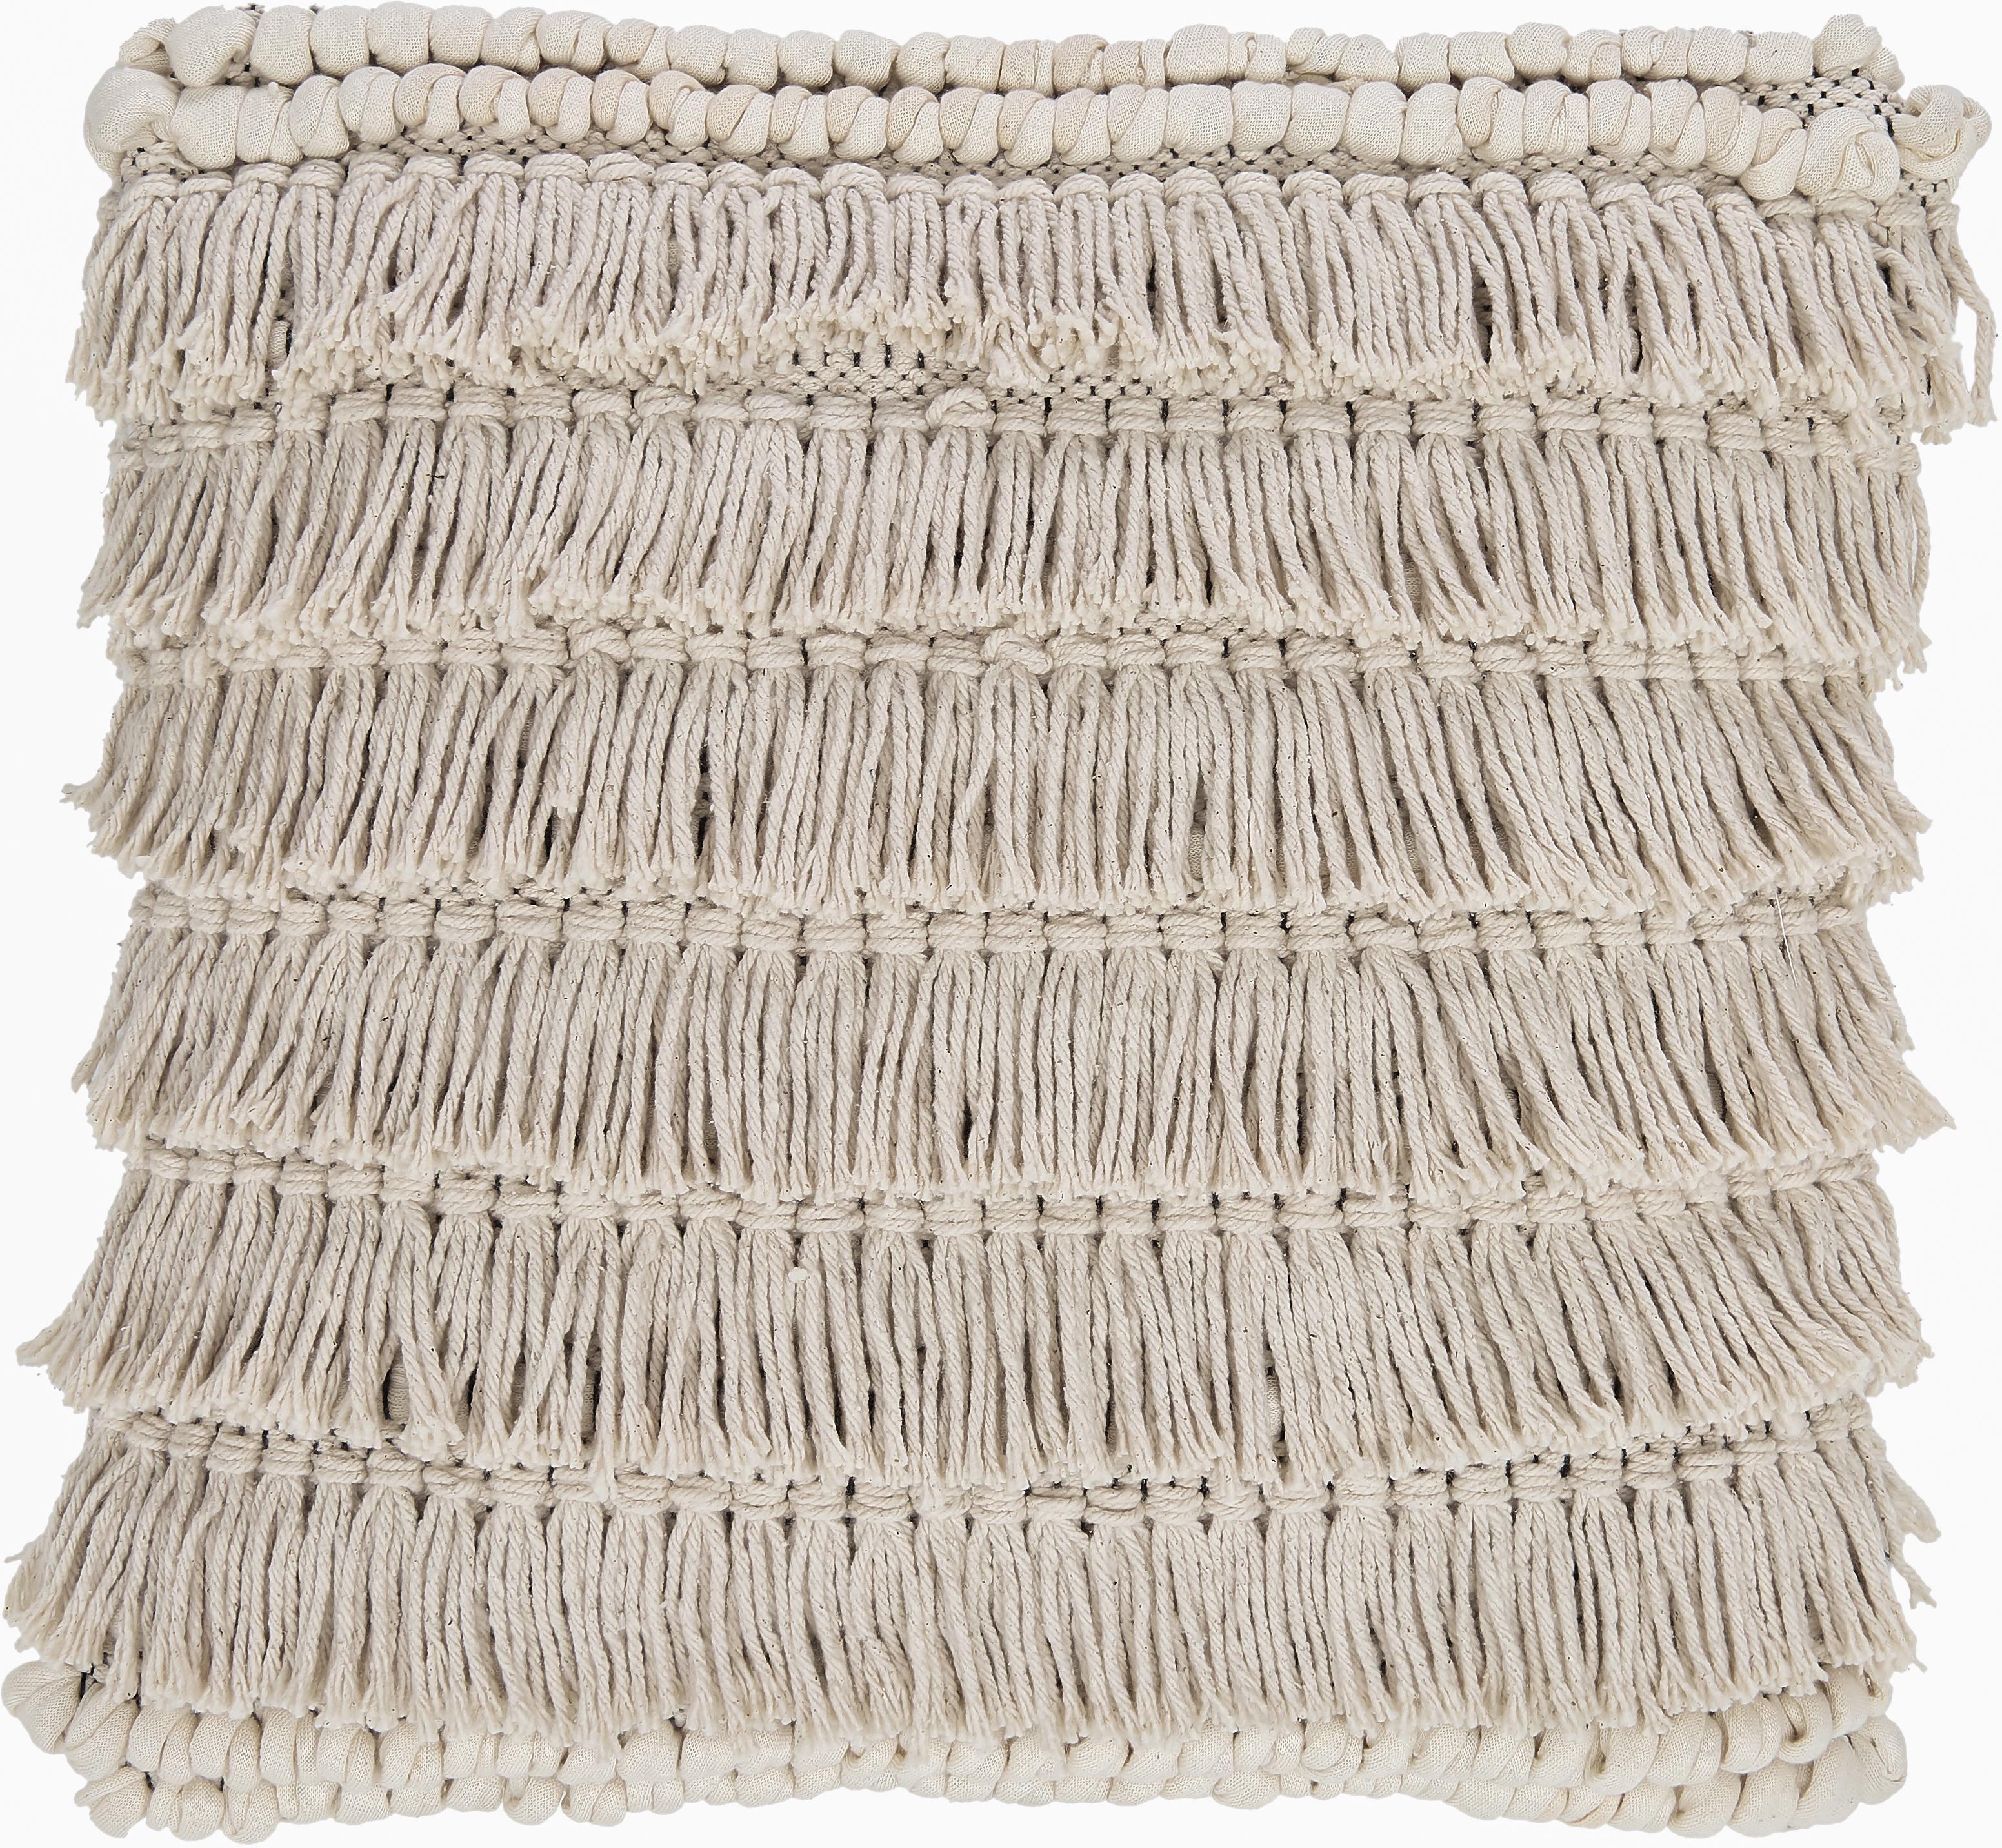 Kussen Tallara, met vulling, Bekleding: gerecycled katoen, Crèmekleurig, 45 x 45 cm